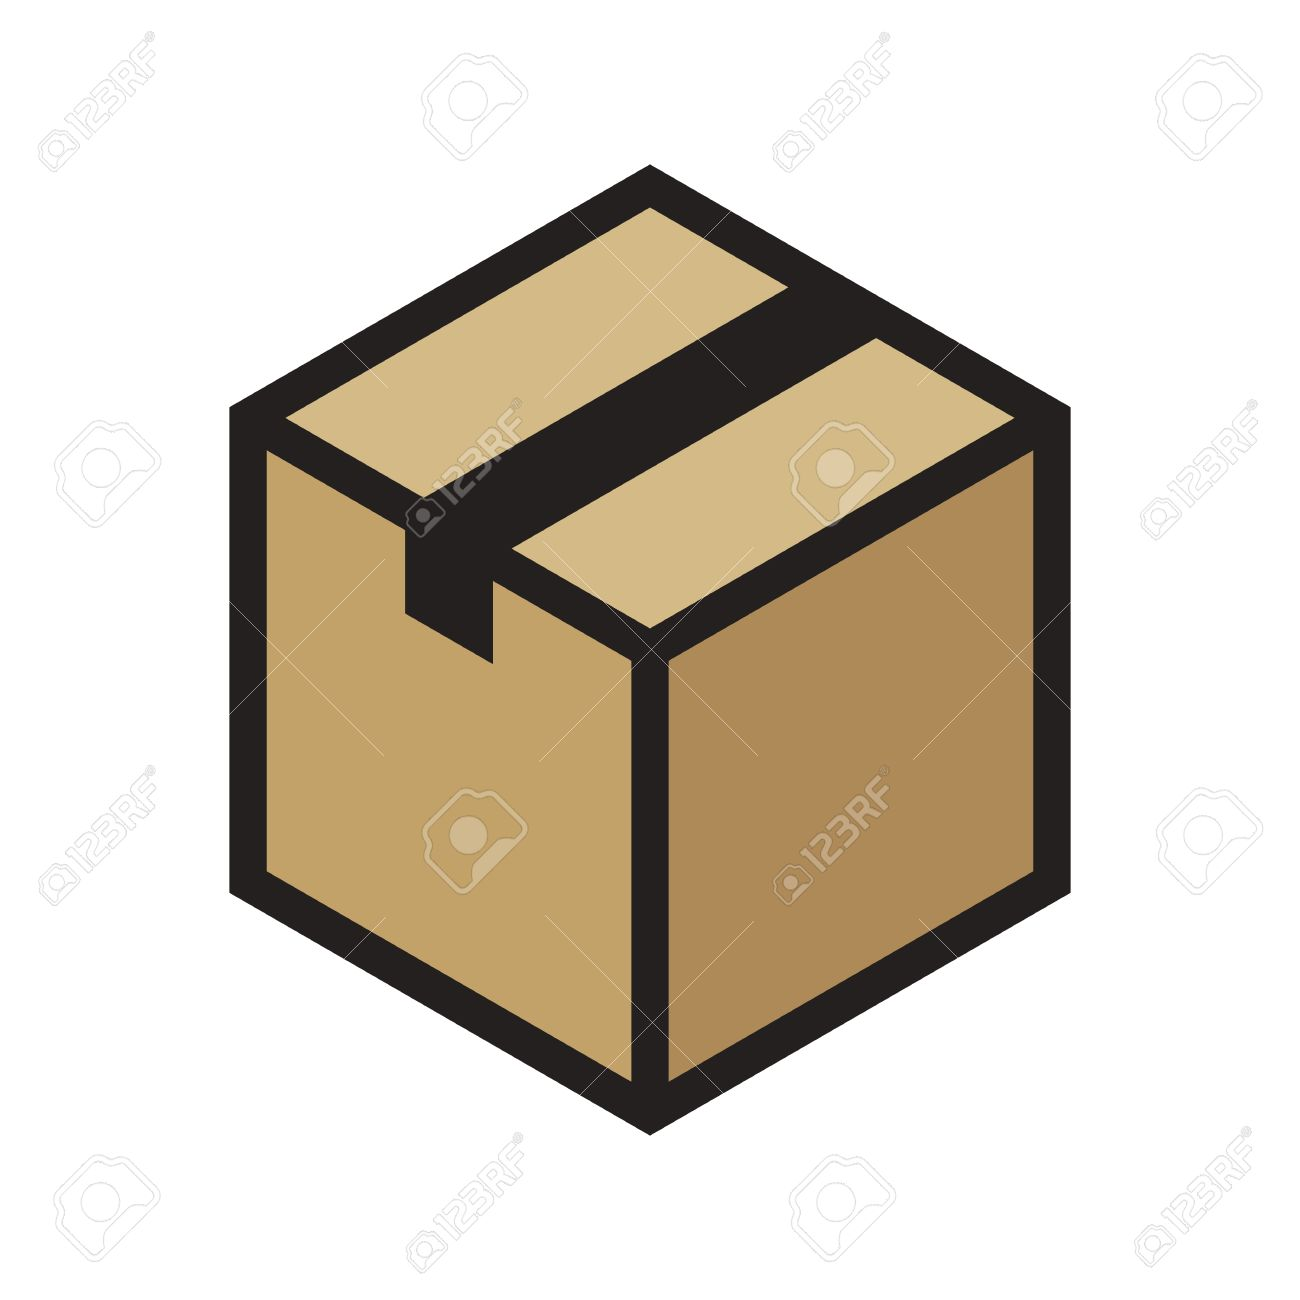 1300x1300 Isometric Cardboard Box Outline Colored Icon, Modern Minimal